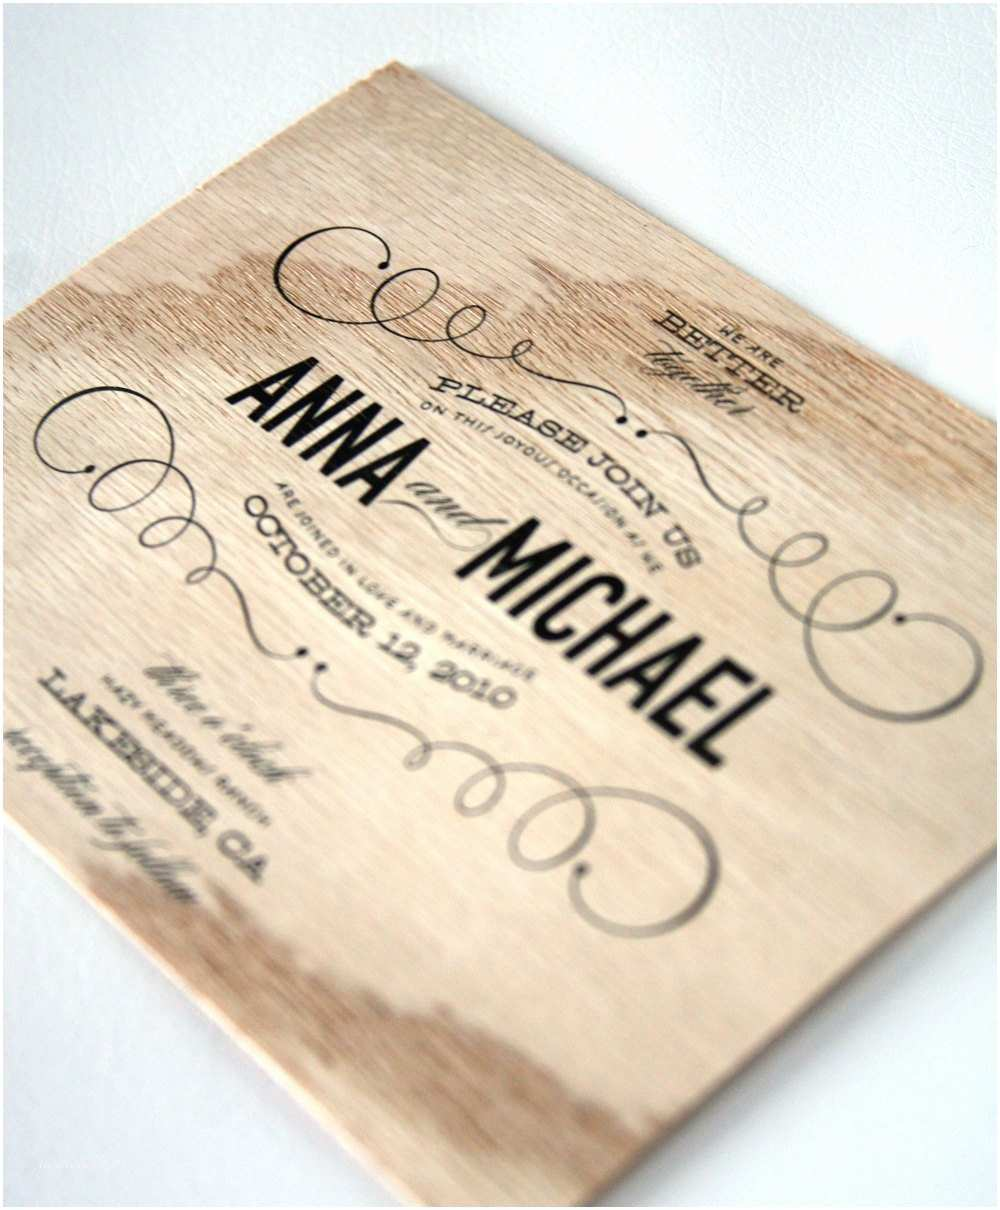 Wood Wedding Invitations Vintage Type Wooden Wedding Invitations by Cheerupcherup